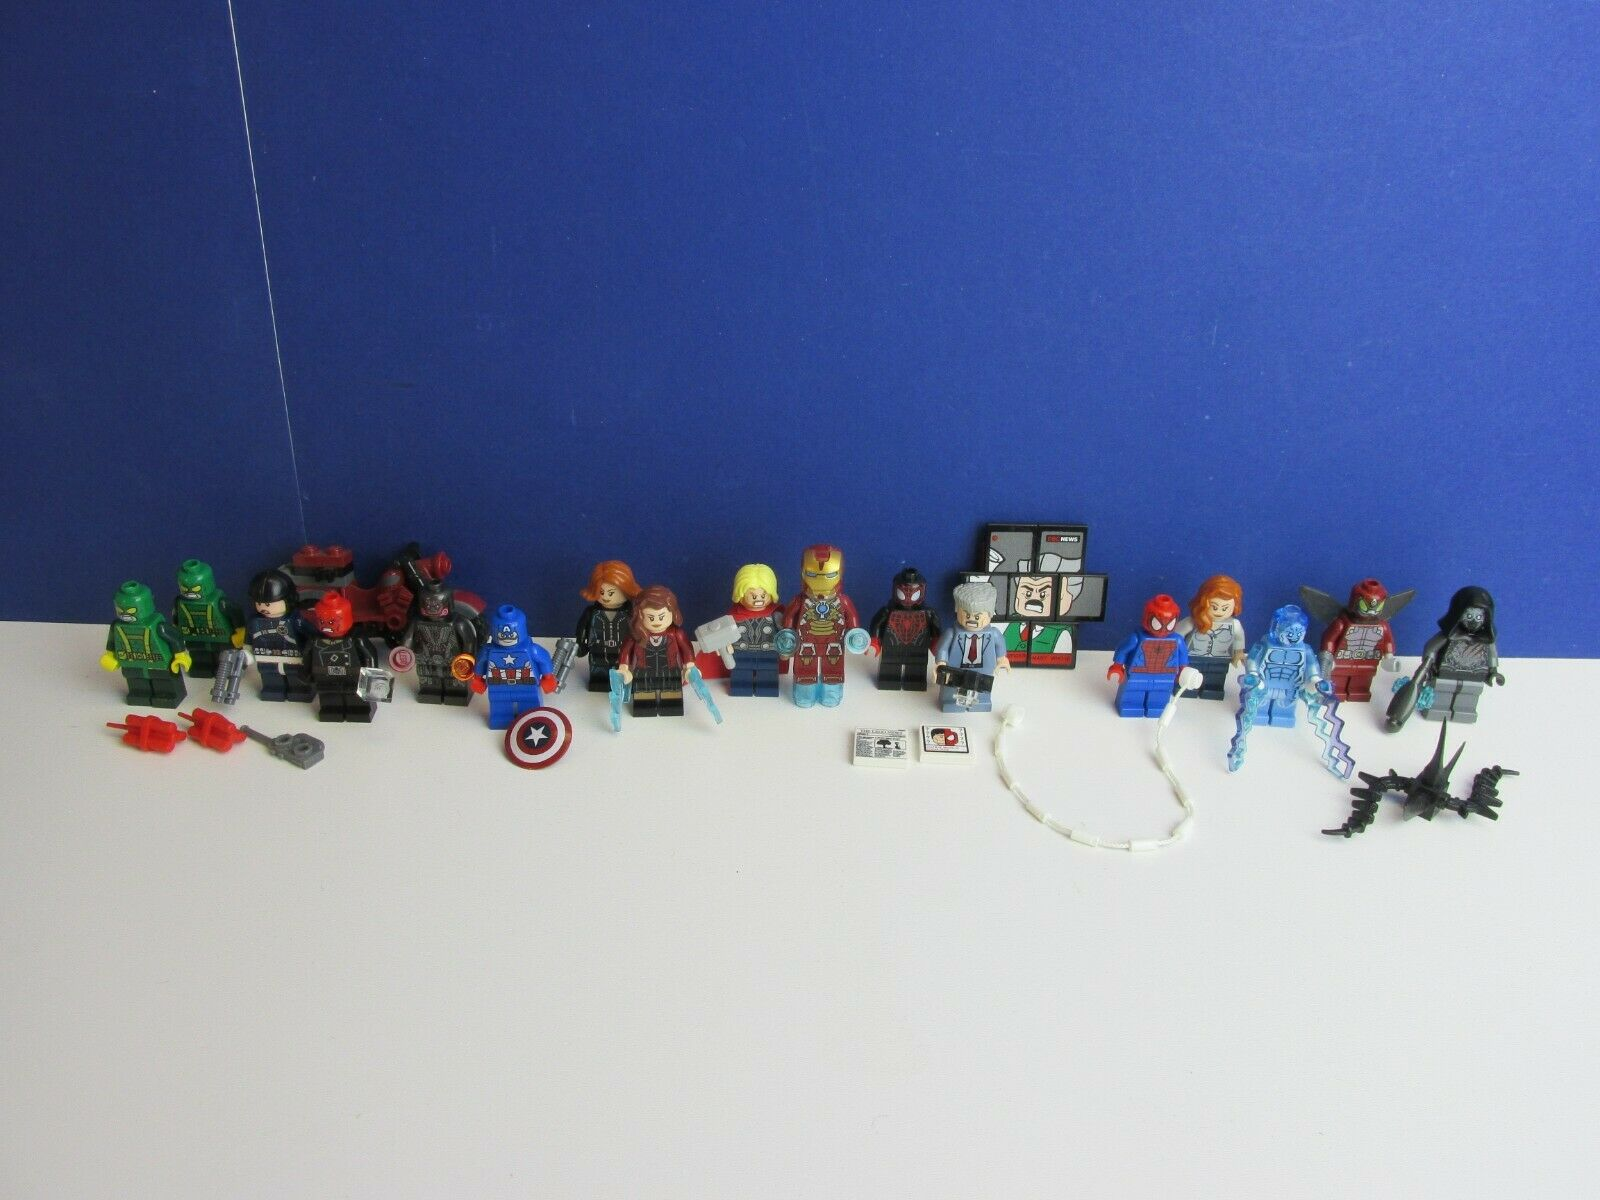 17 genuine LEGO AVENGERS ASSEMBLE TEAM SET minifigure MARVEL SUPER HERO 26J